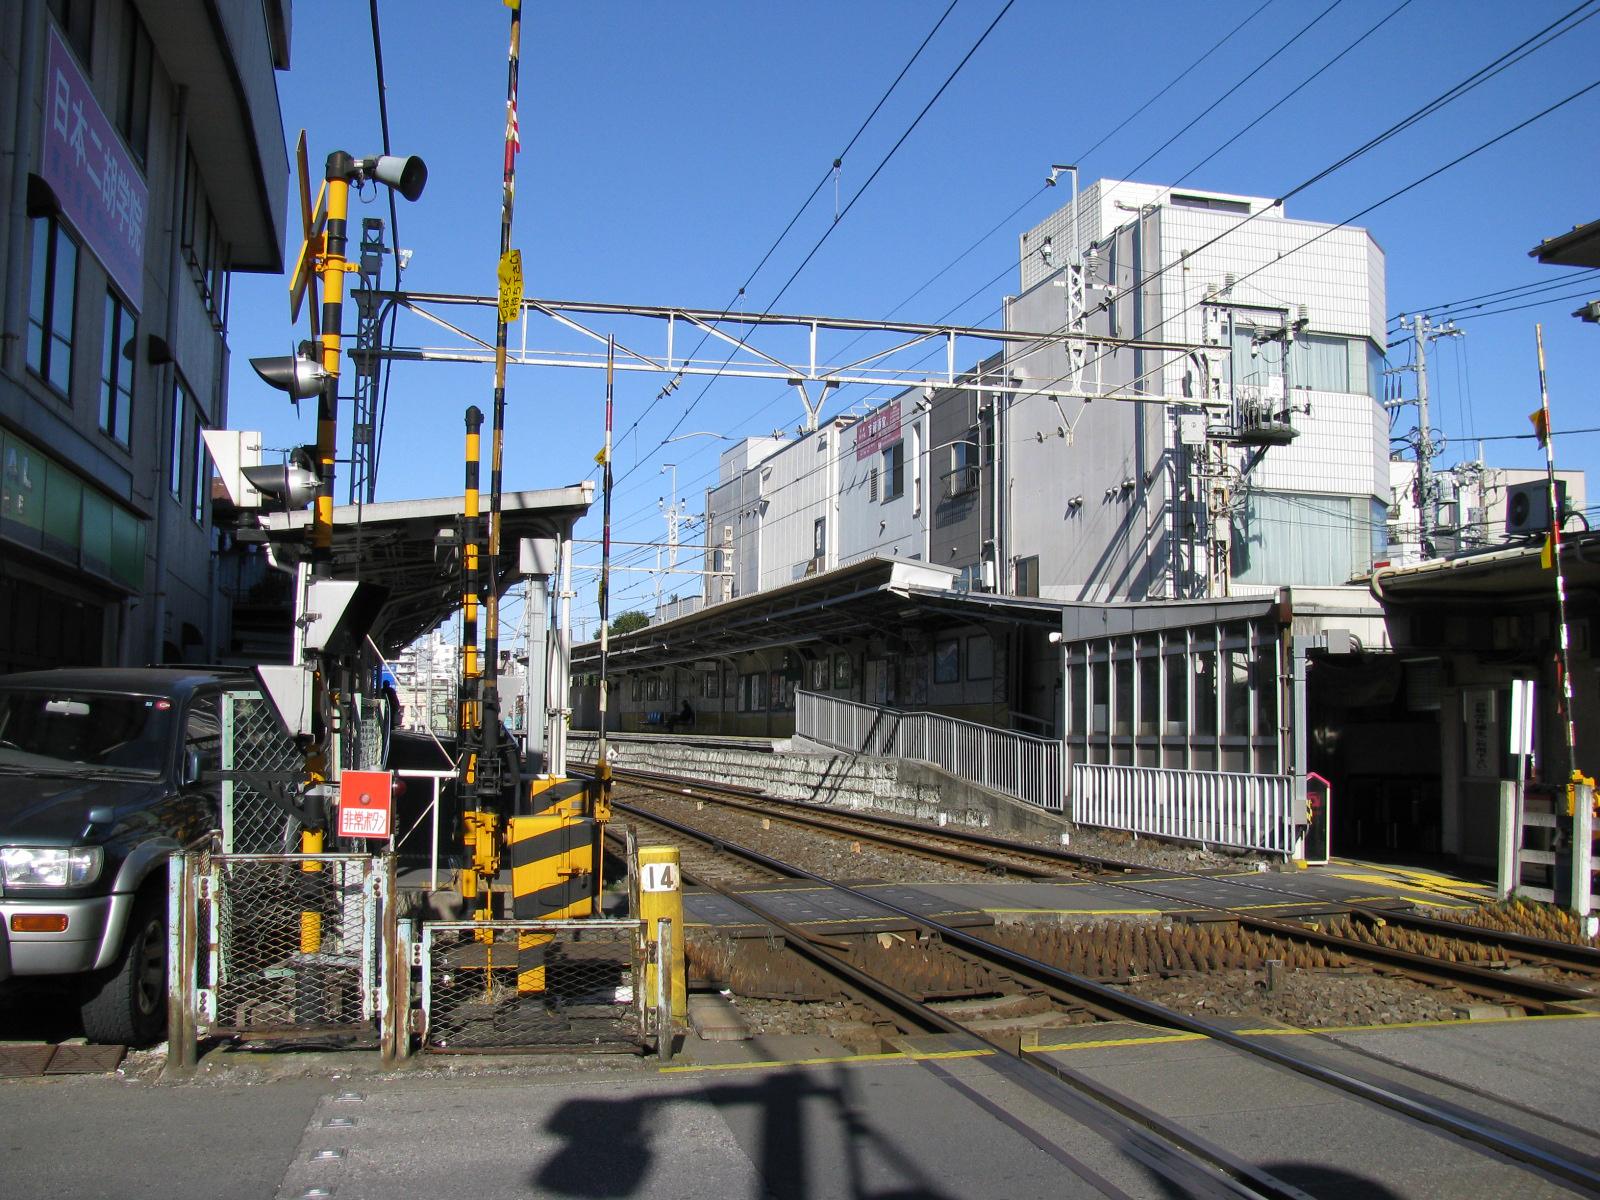 https://upload.wikimedia.org/wikipedia/commons/9/9c/Tobu_Higashiazuma_sta_002.jpg